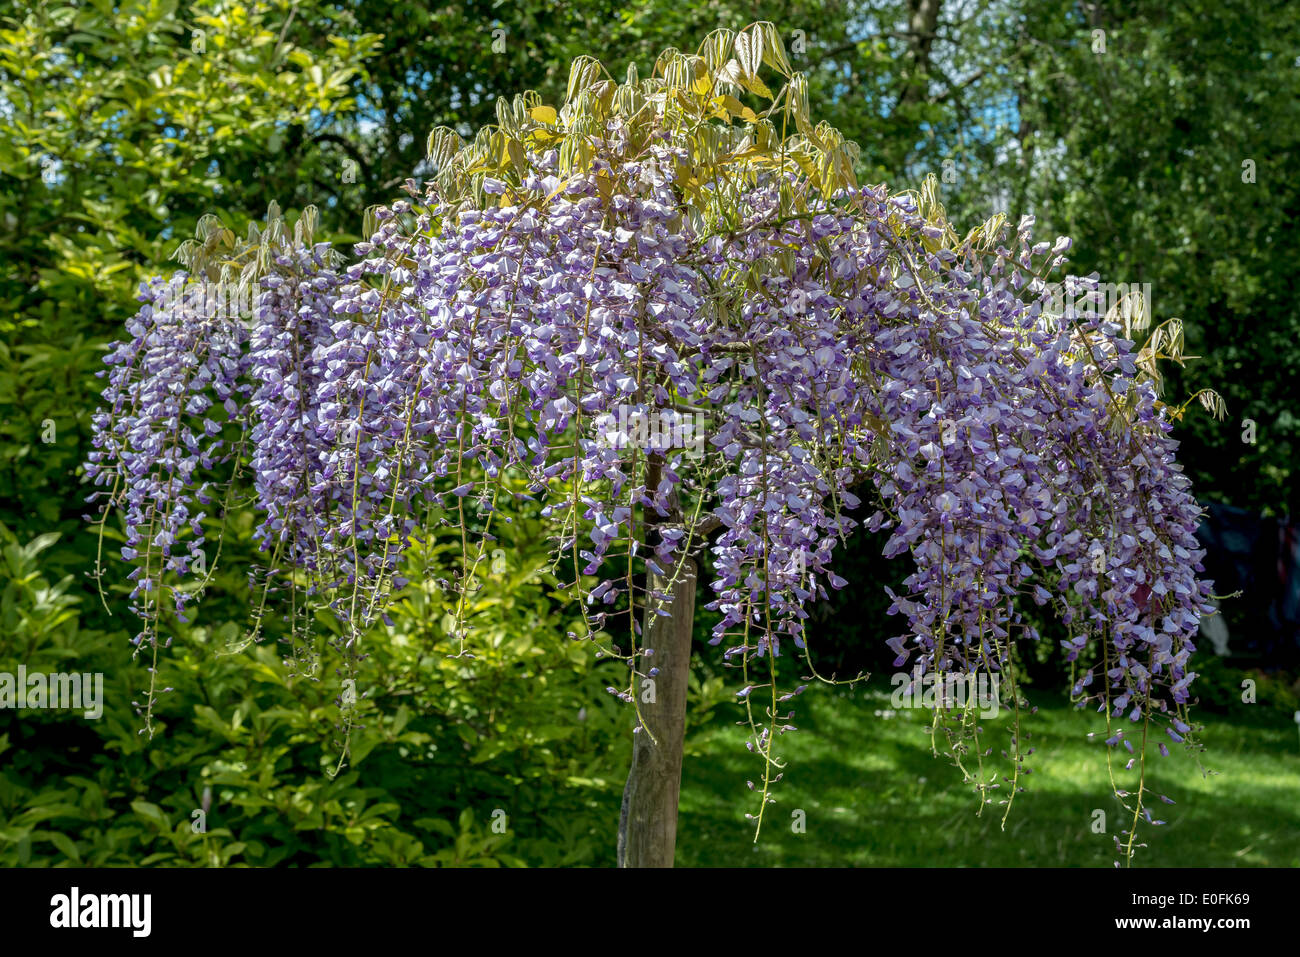 A wisteria sinensis plant as a specimen tree stock photo for Specimen trees